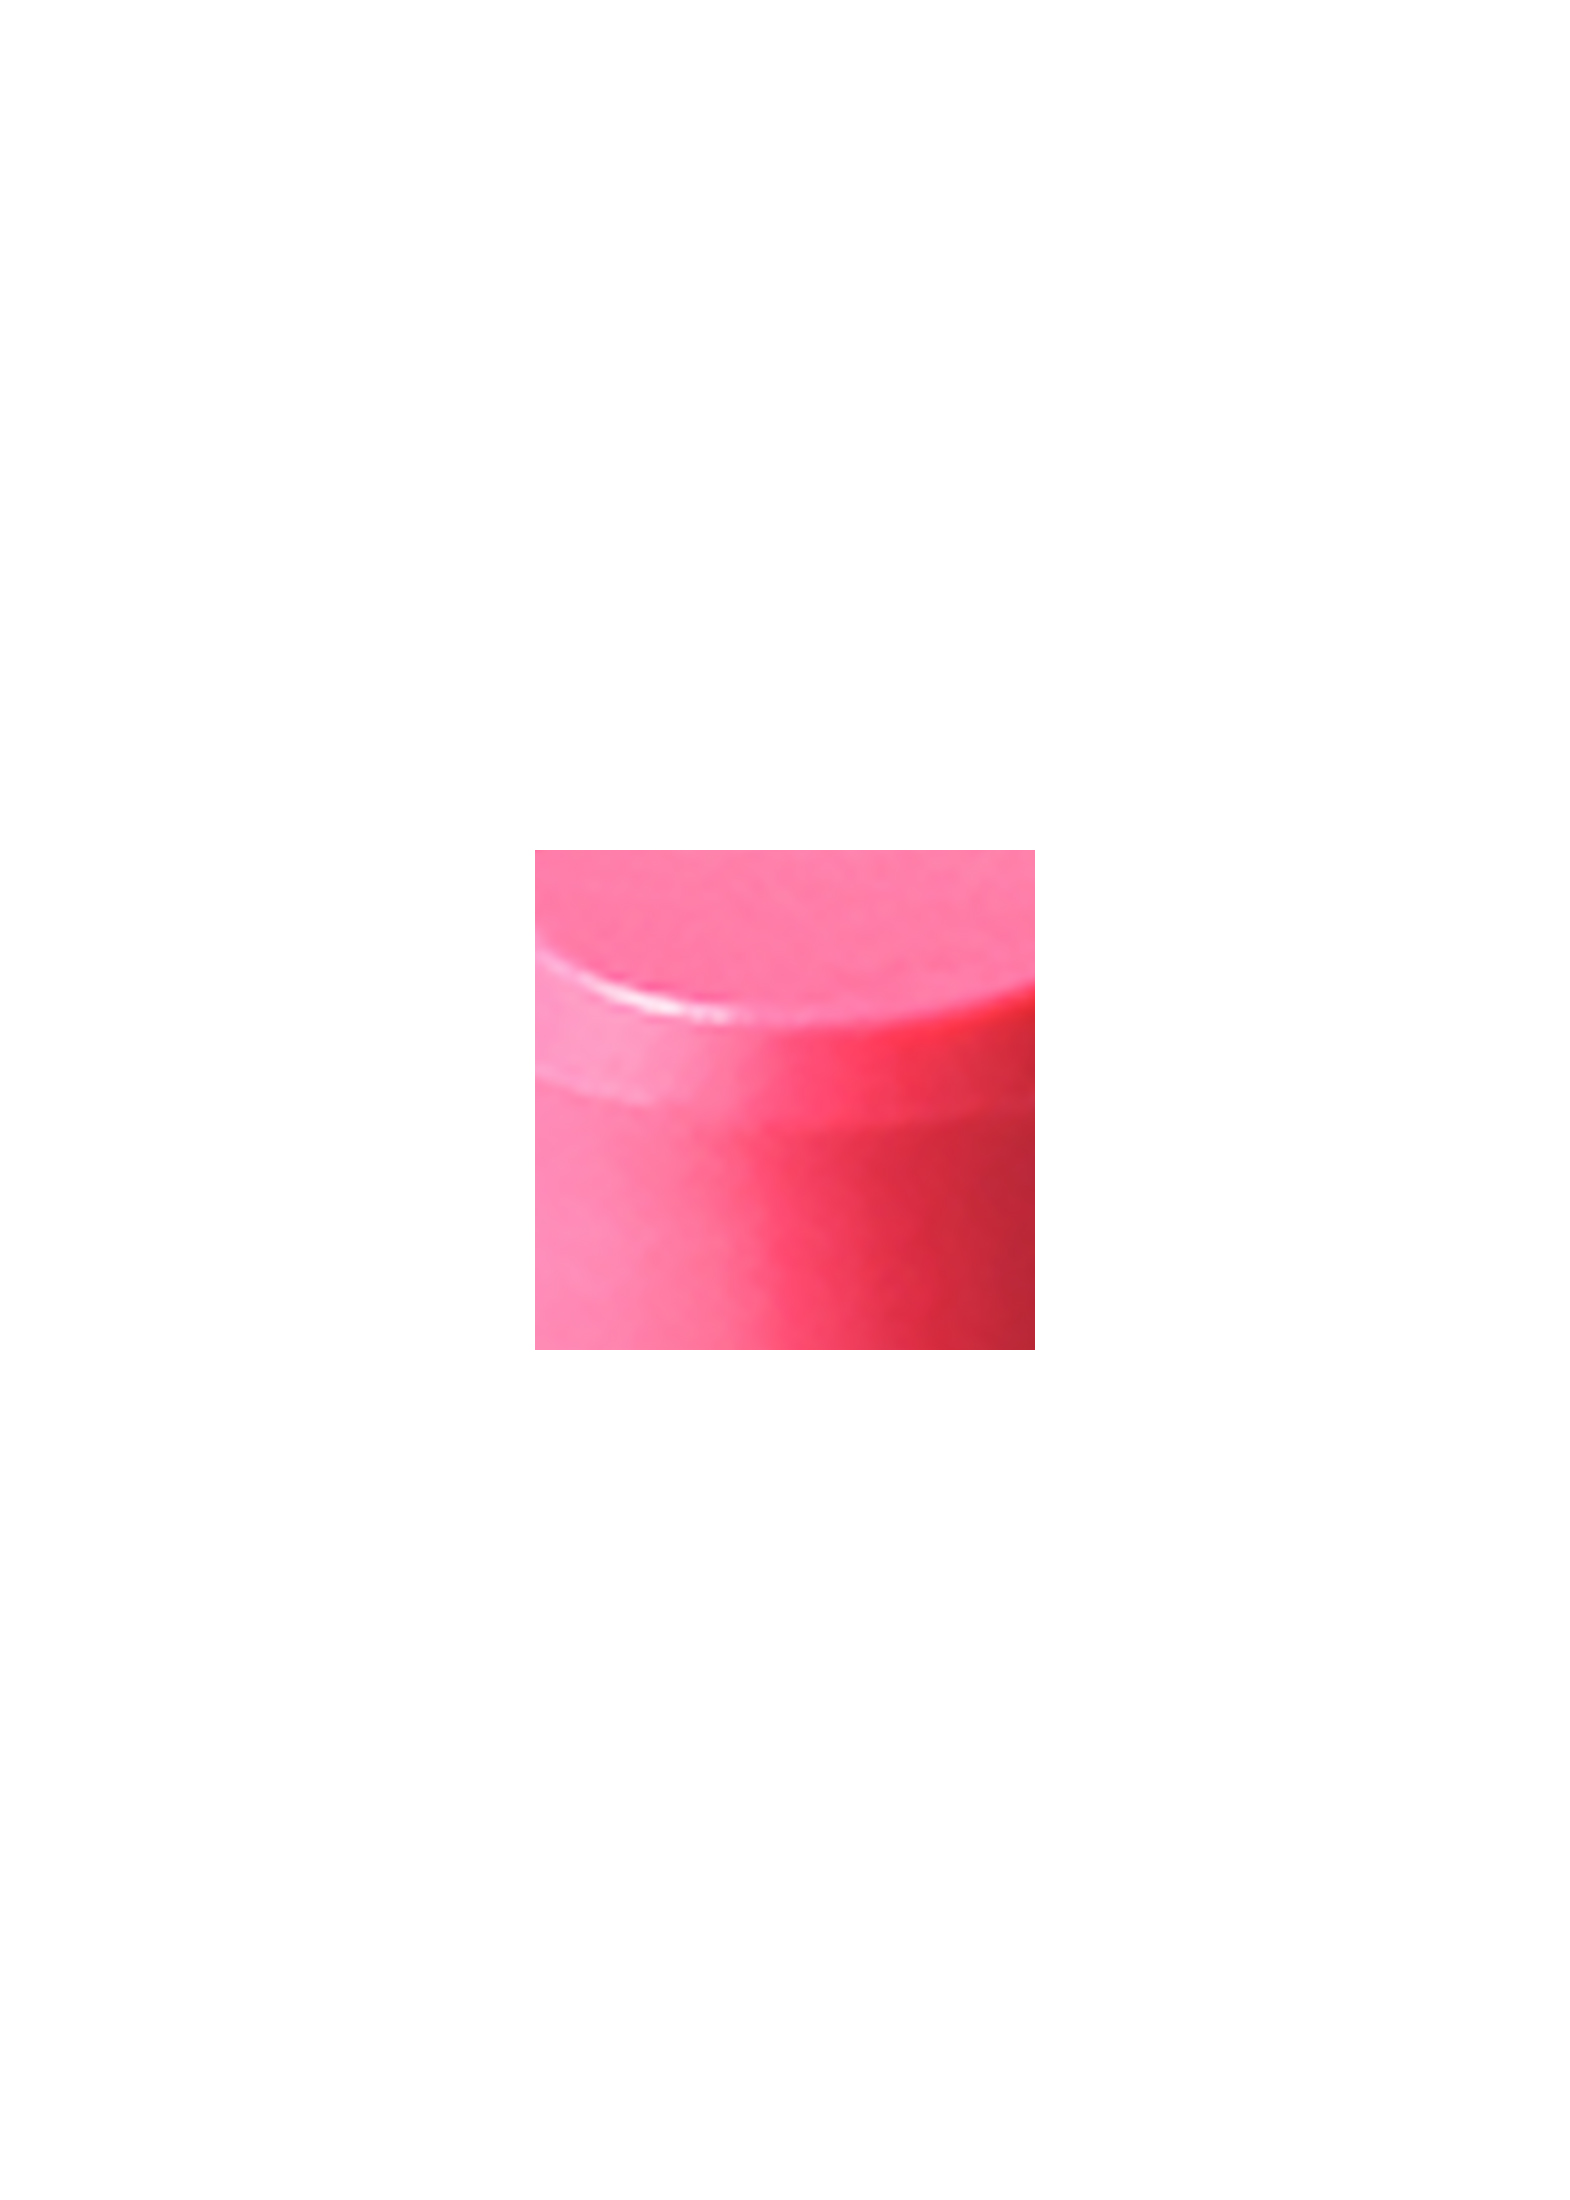 GLOW PLAY LIP BALM-FLORA 3.6GM/.12OZ image number 3